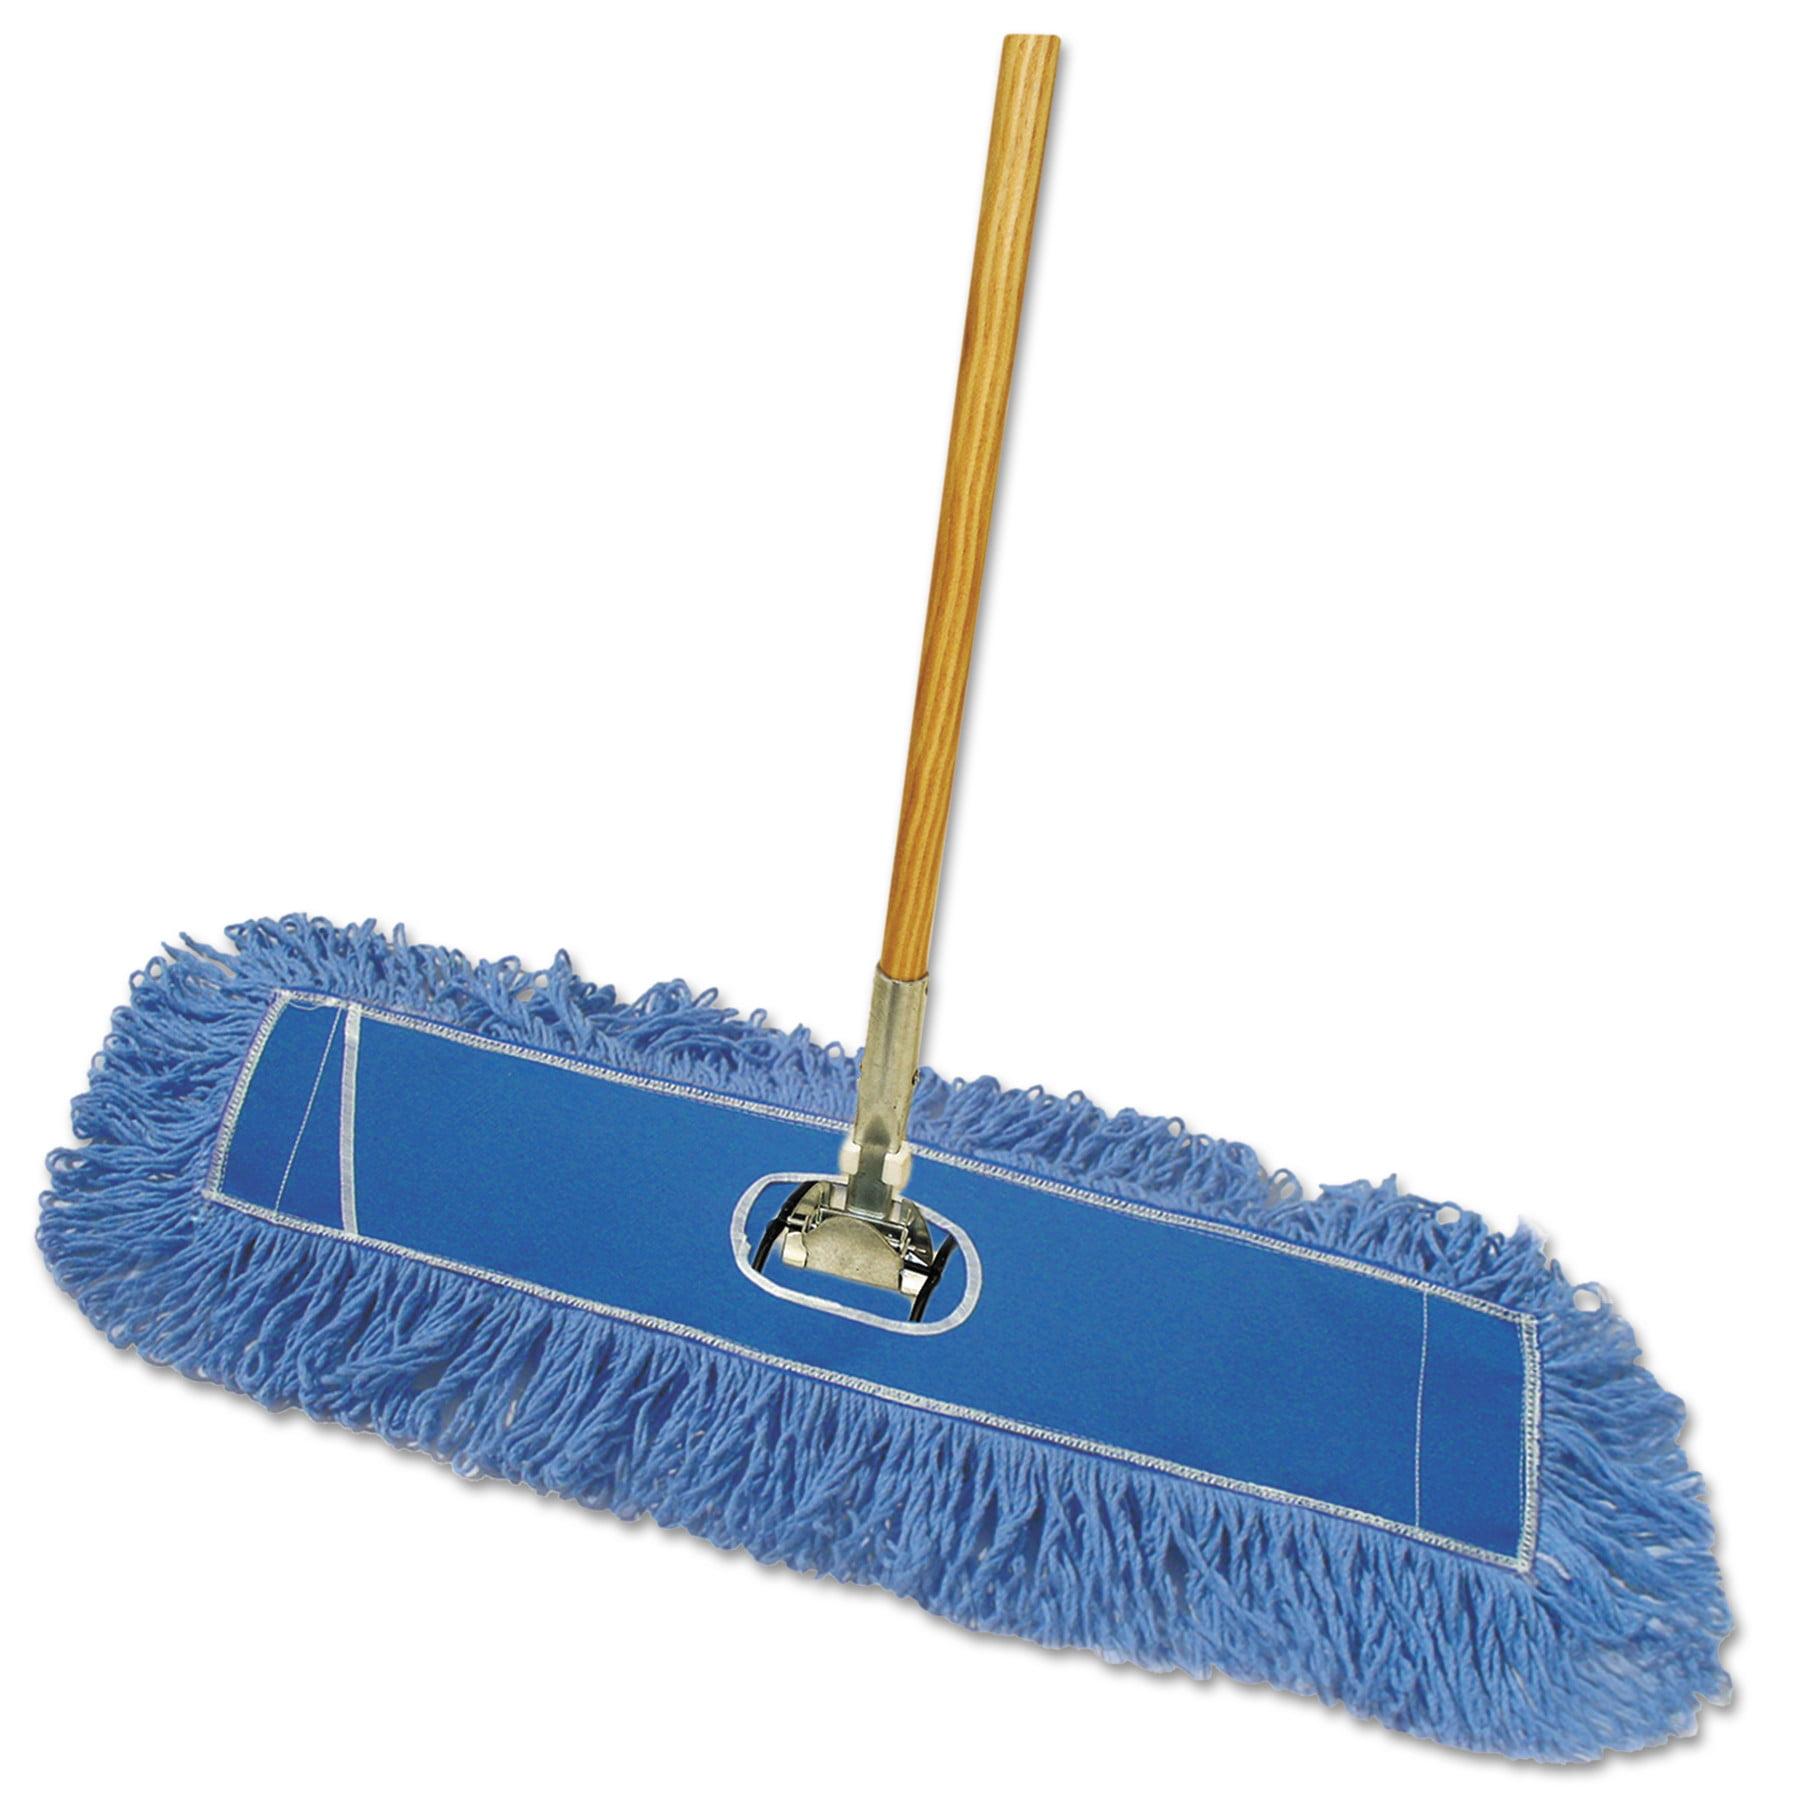 "Boardwalk Looped-End Dust Mop Kit, 36 x 5, 60"" Metal/Wood Handle, Blue/Natural -BWKHL365BSPC"